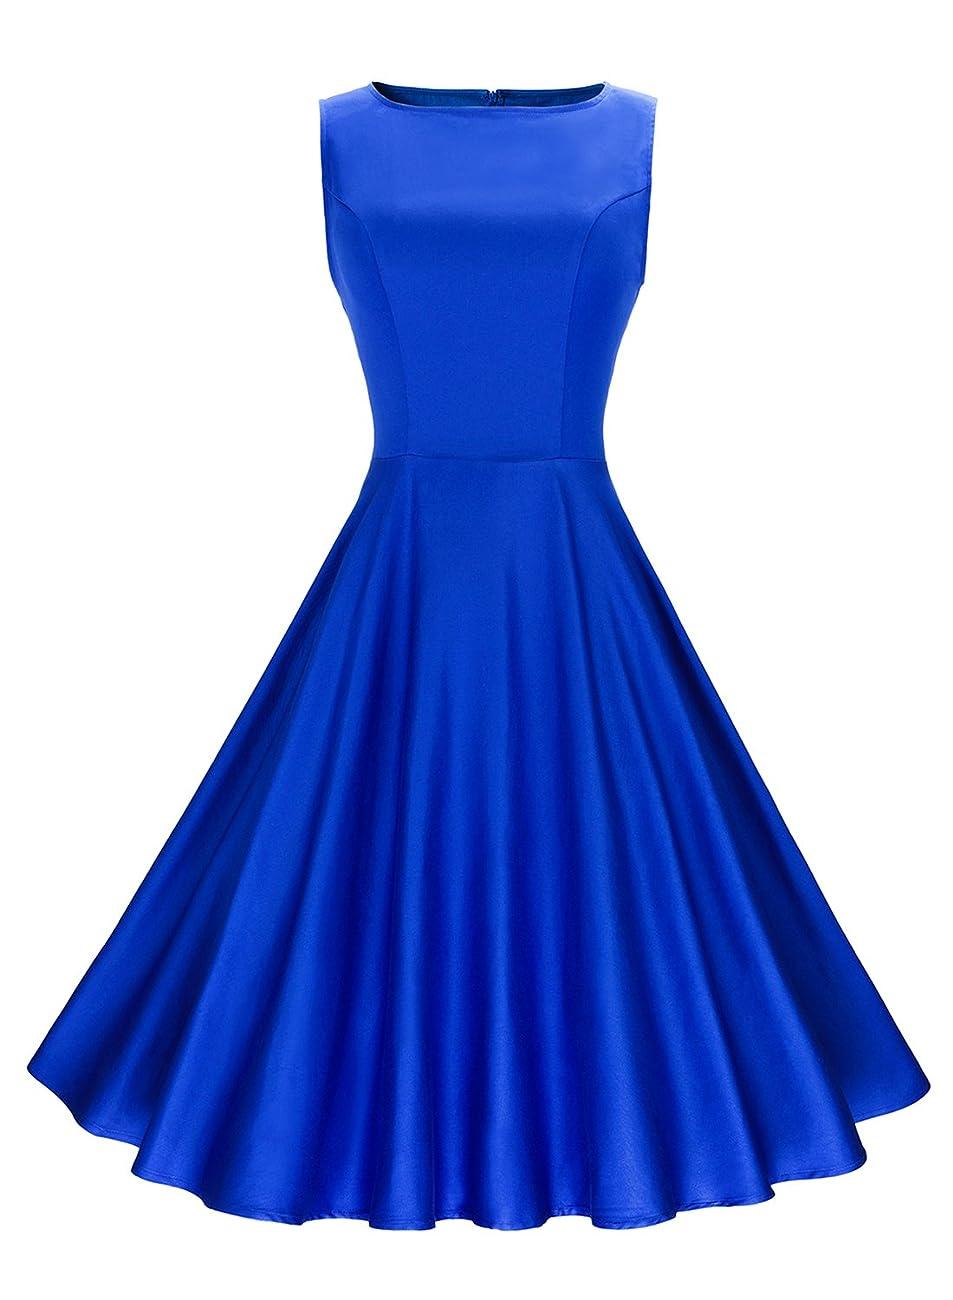 Anni Coco Women's Classy Audrey Hepburn 1950s Vintage Rockabilly Swing Dress blue 0